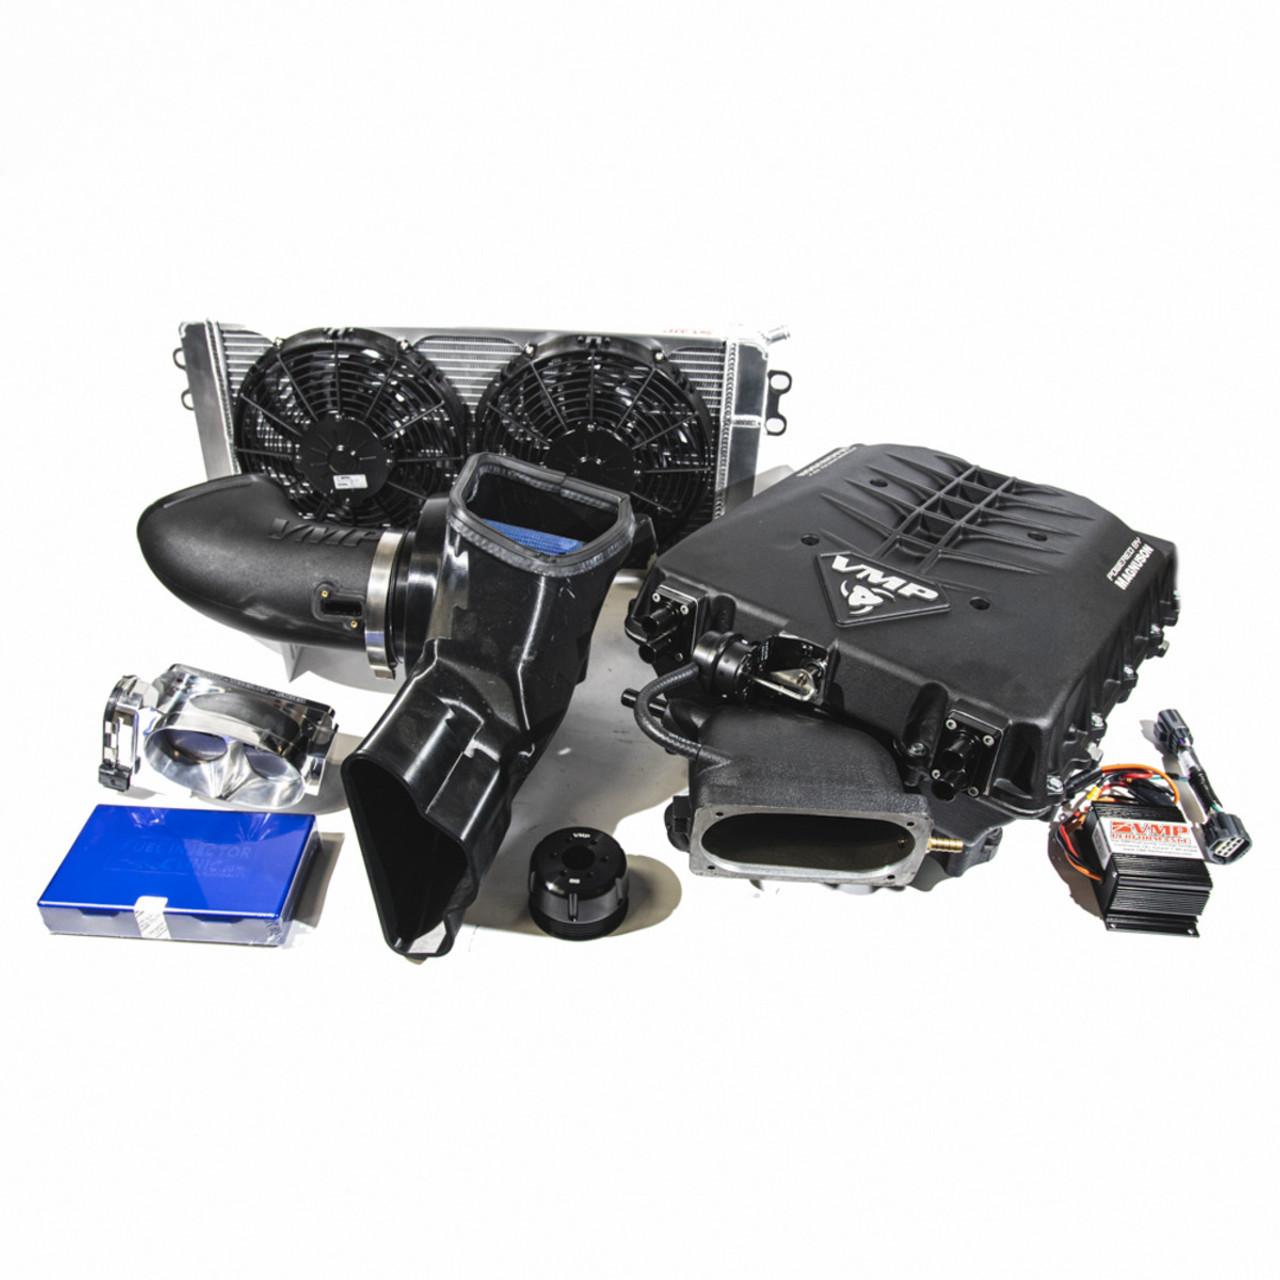 VMP ODIN Supercharger Kit (2018+ F150 5.0L) VMP-SK1820FODIN